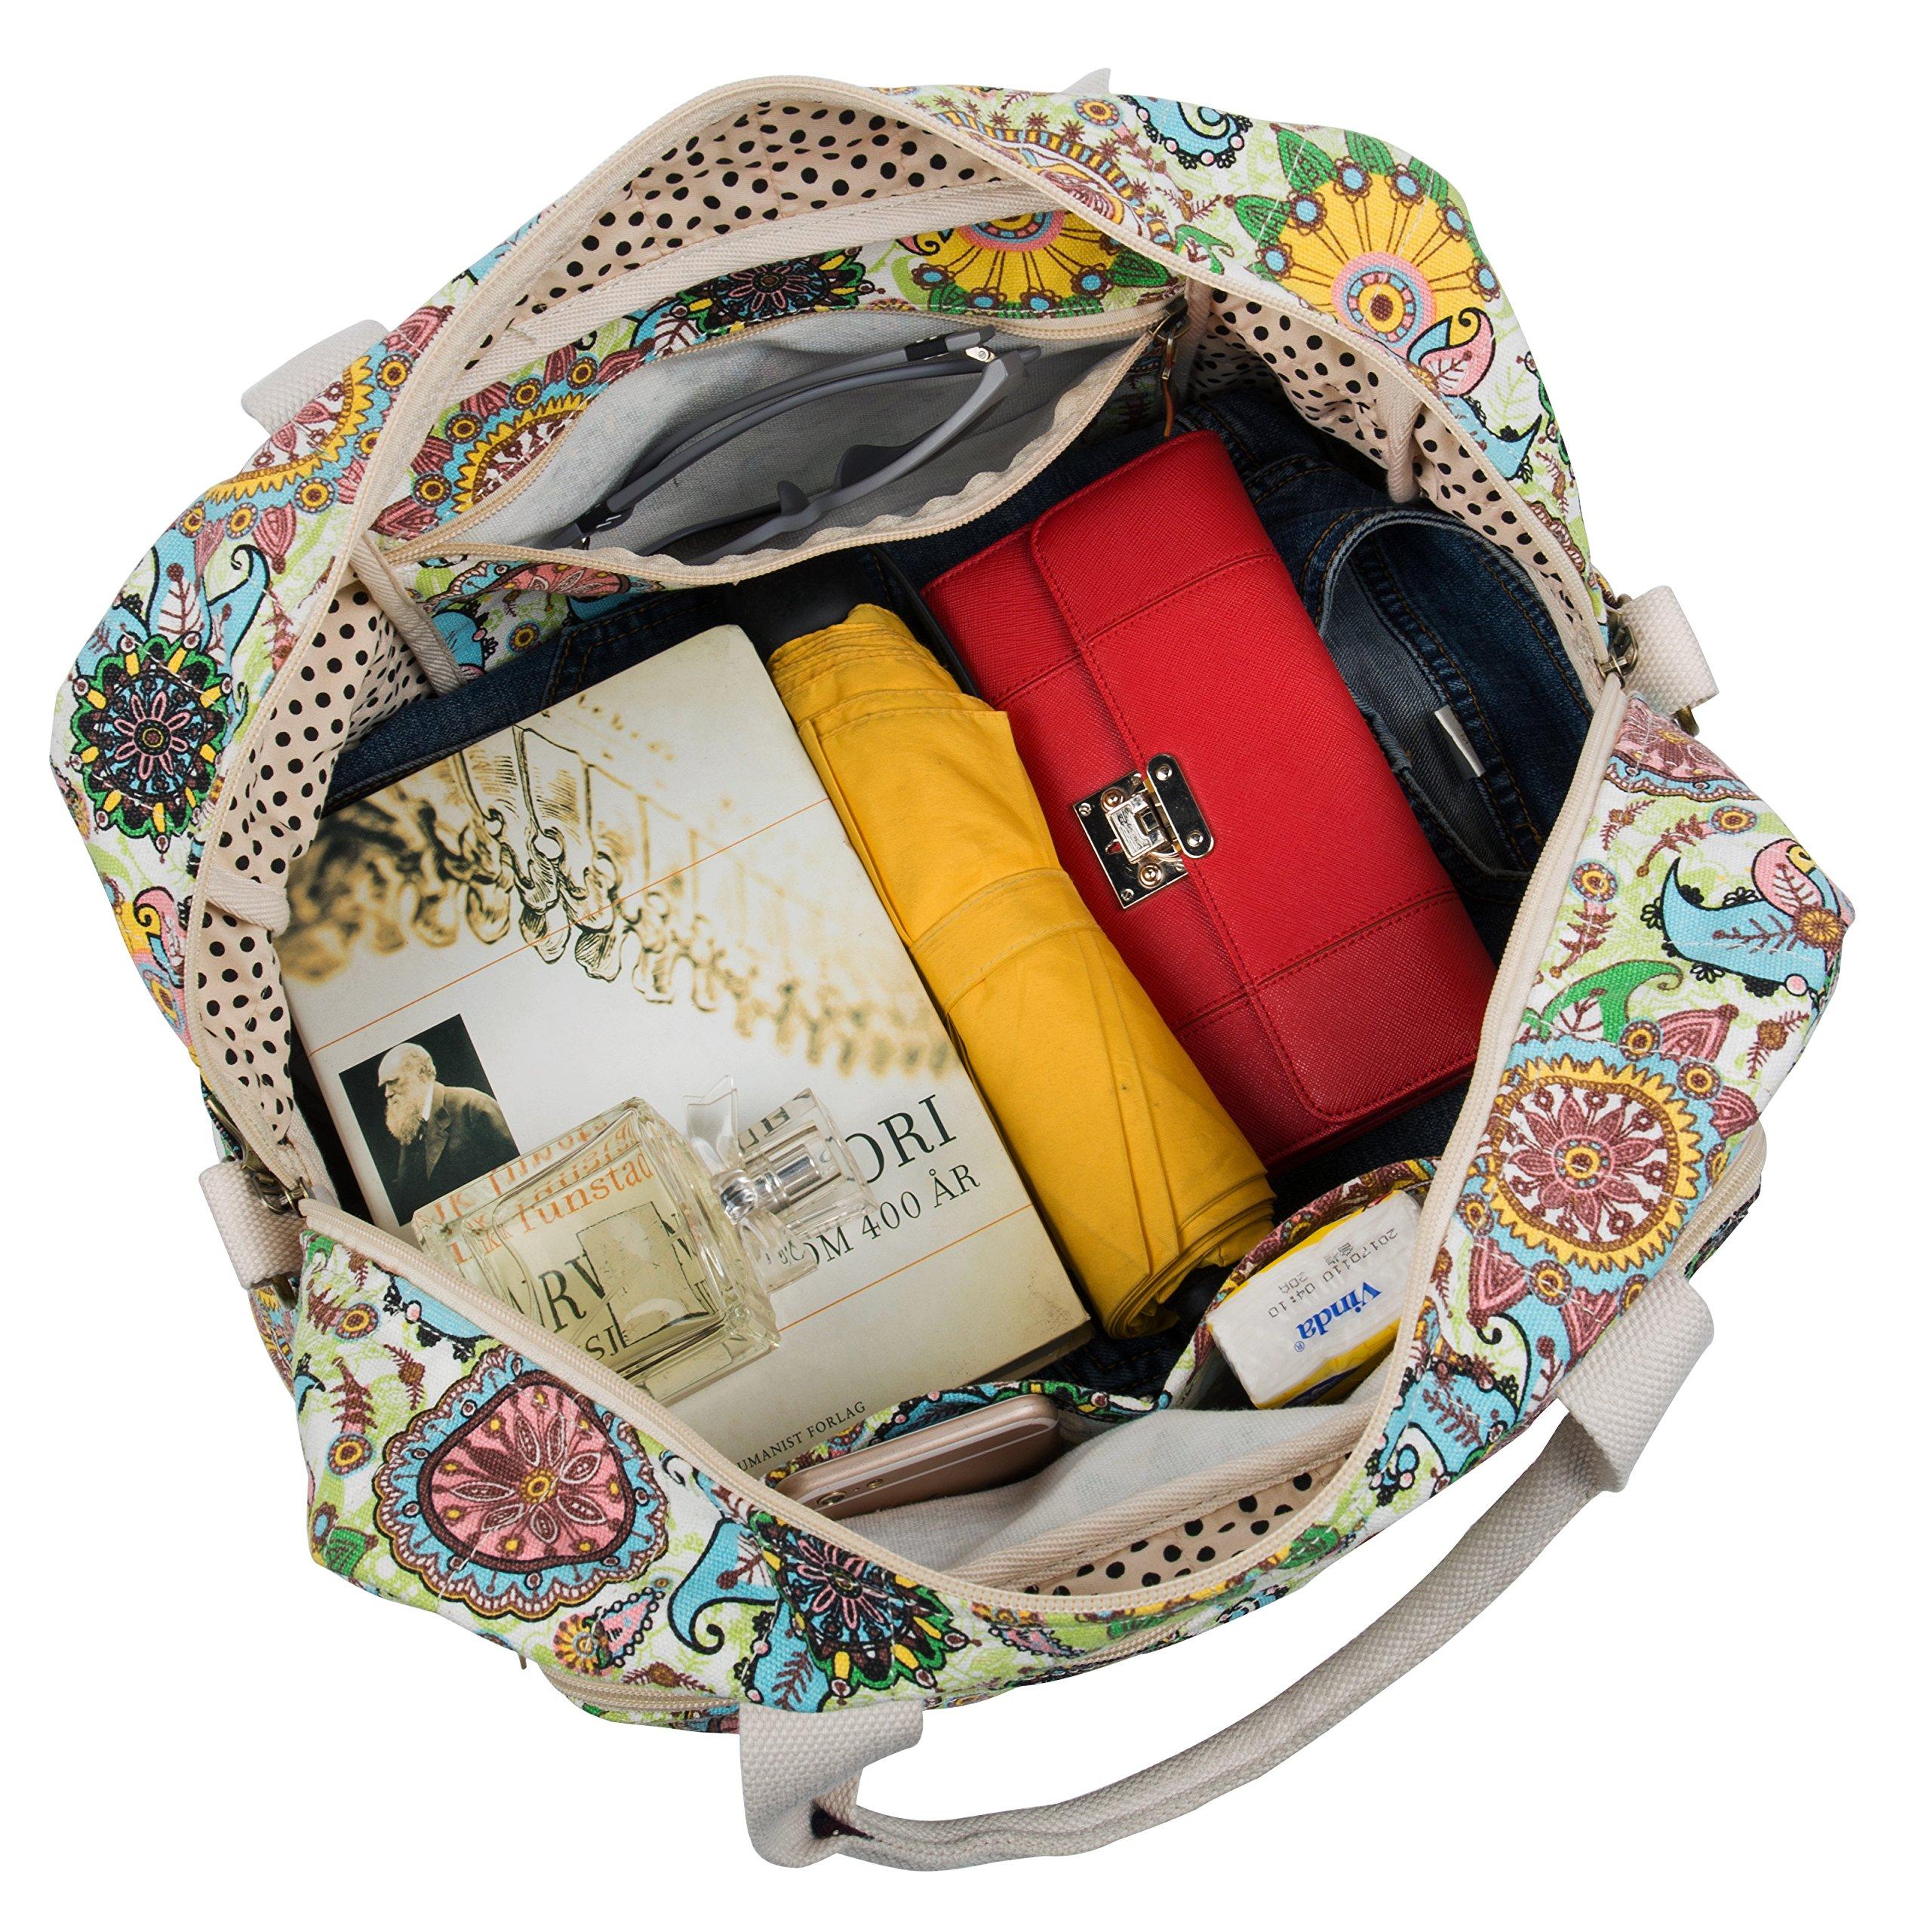 Malirona Canvas Overnight Bag Women Weekender Bag Carry On Travel Duffel Bag Floral Design (Flower) by Malirona (Image #7)